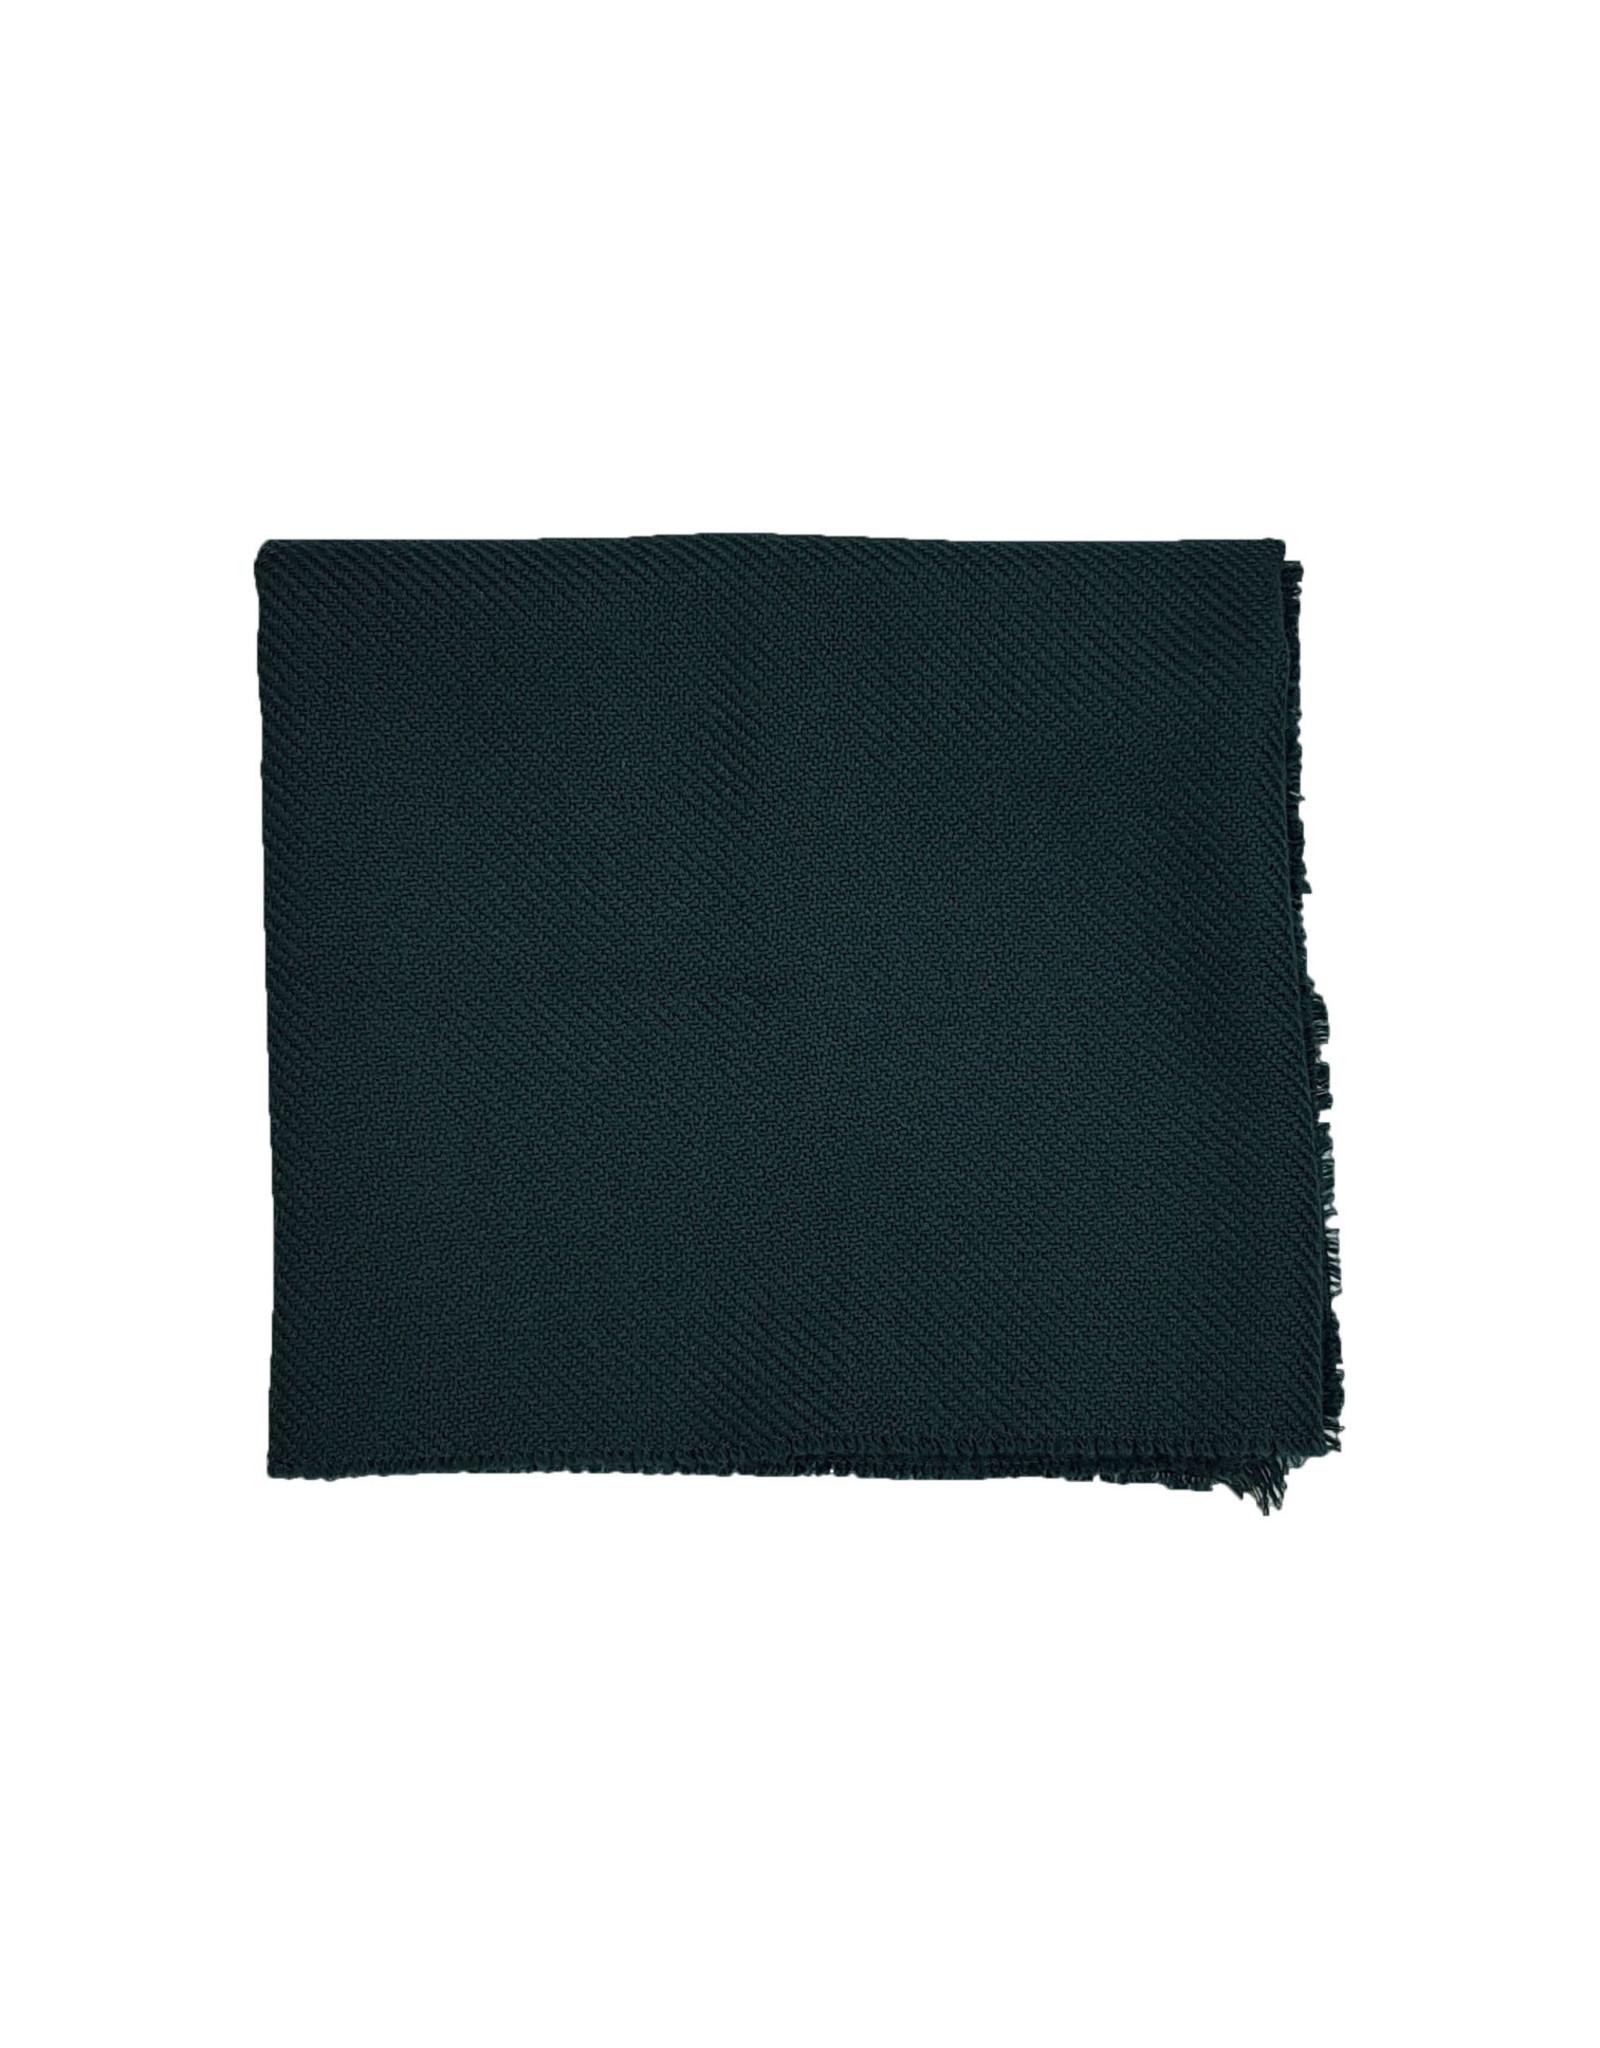 MA.AL.Bi MA.AL.BI sjaal groen 140-60